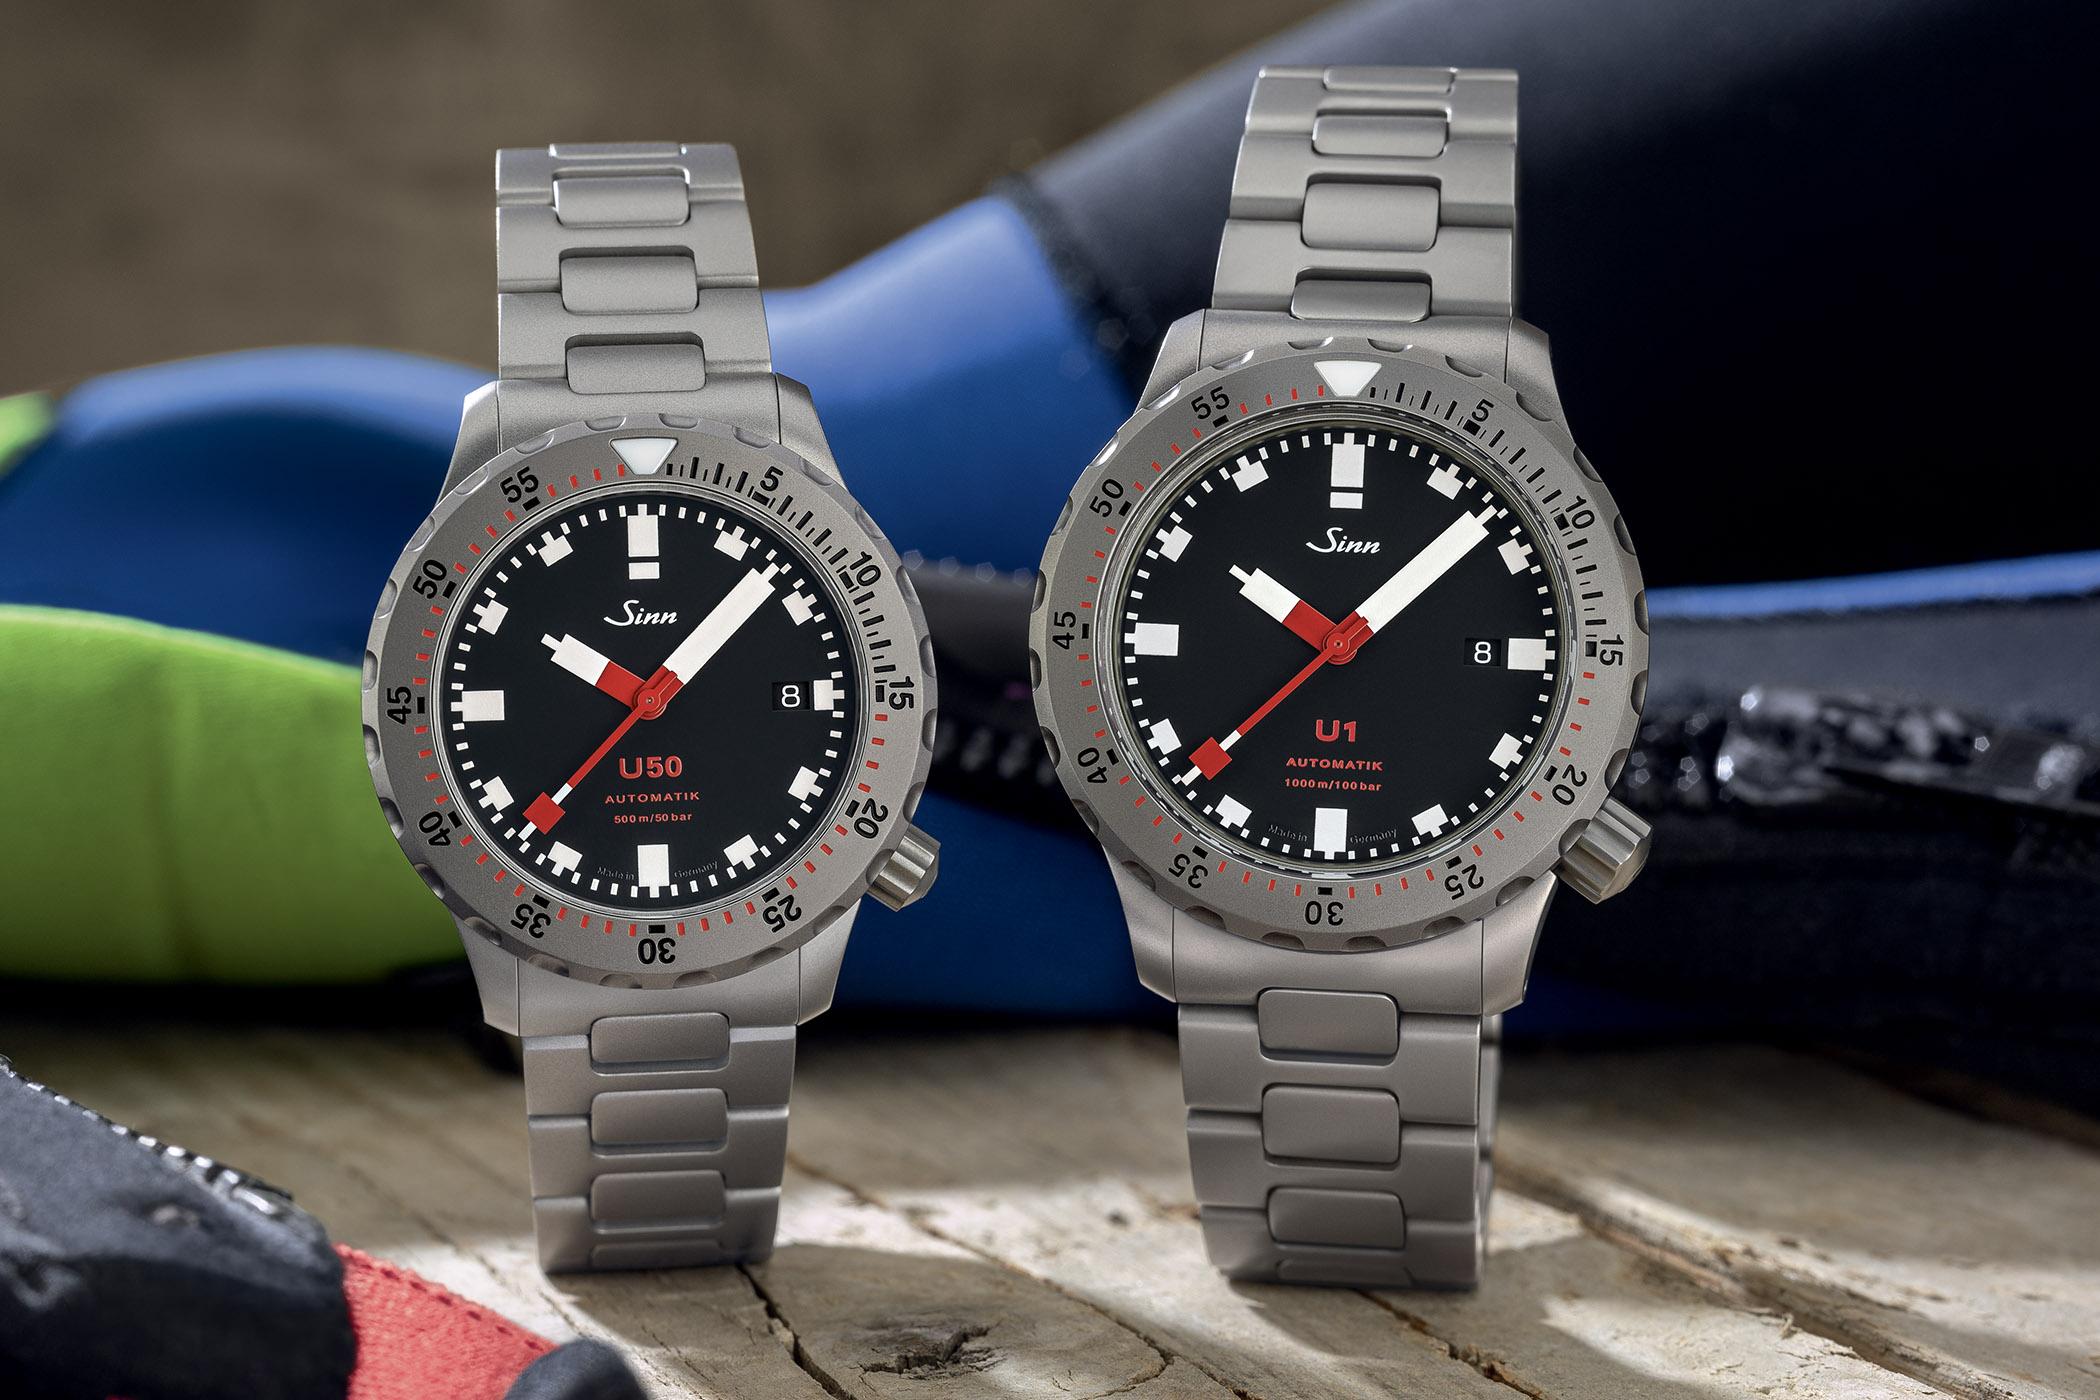 Sinn Dive Watch U1 vs U50